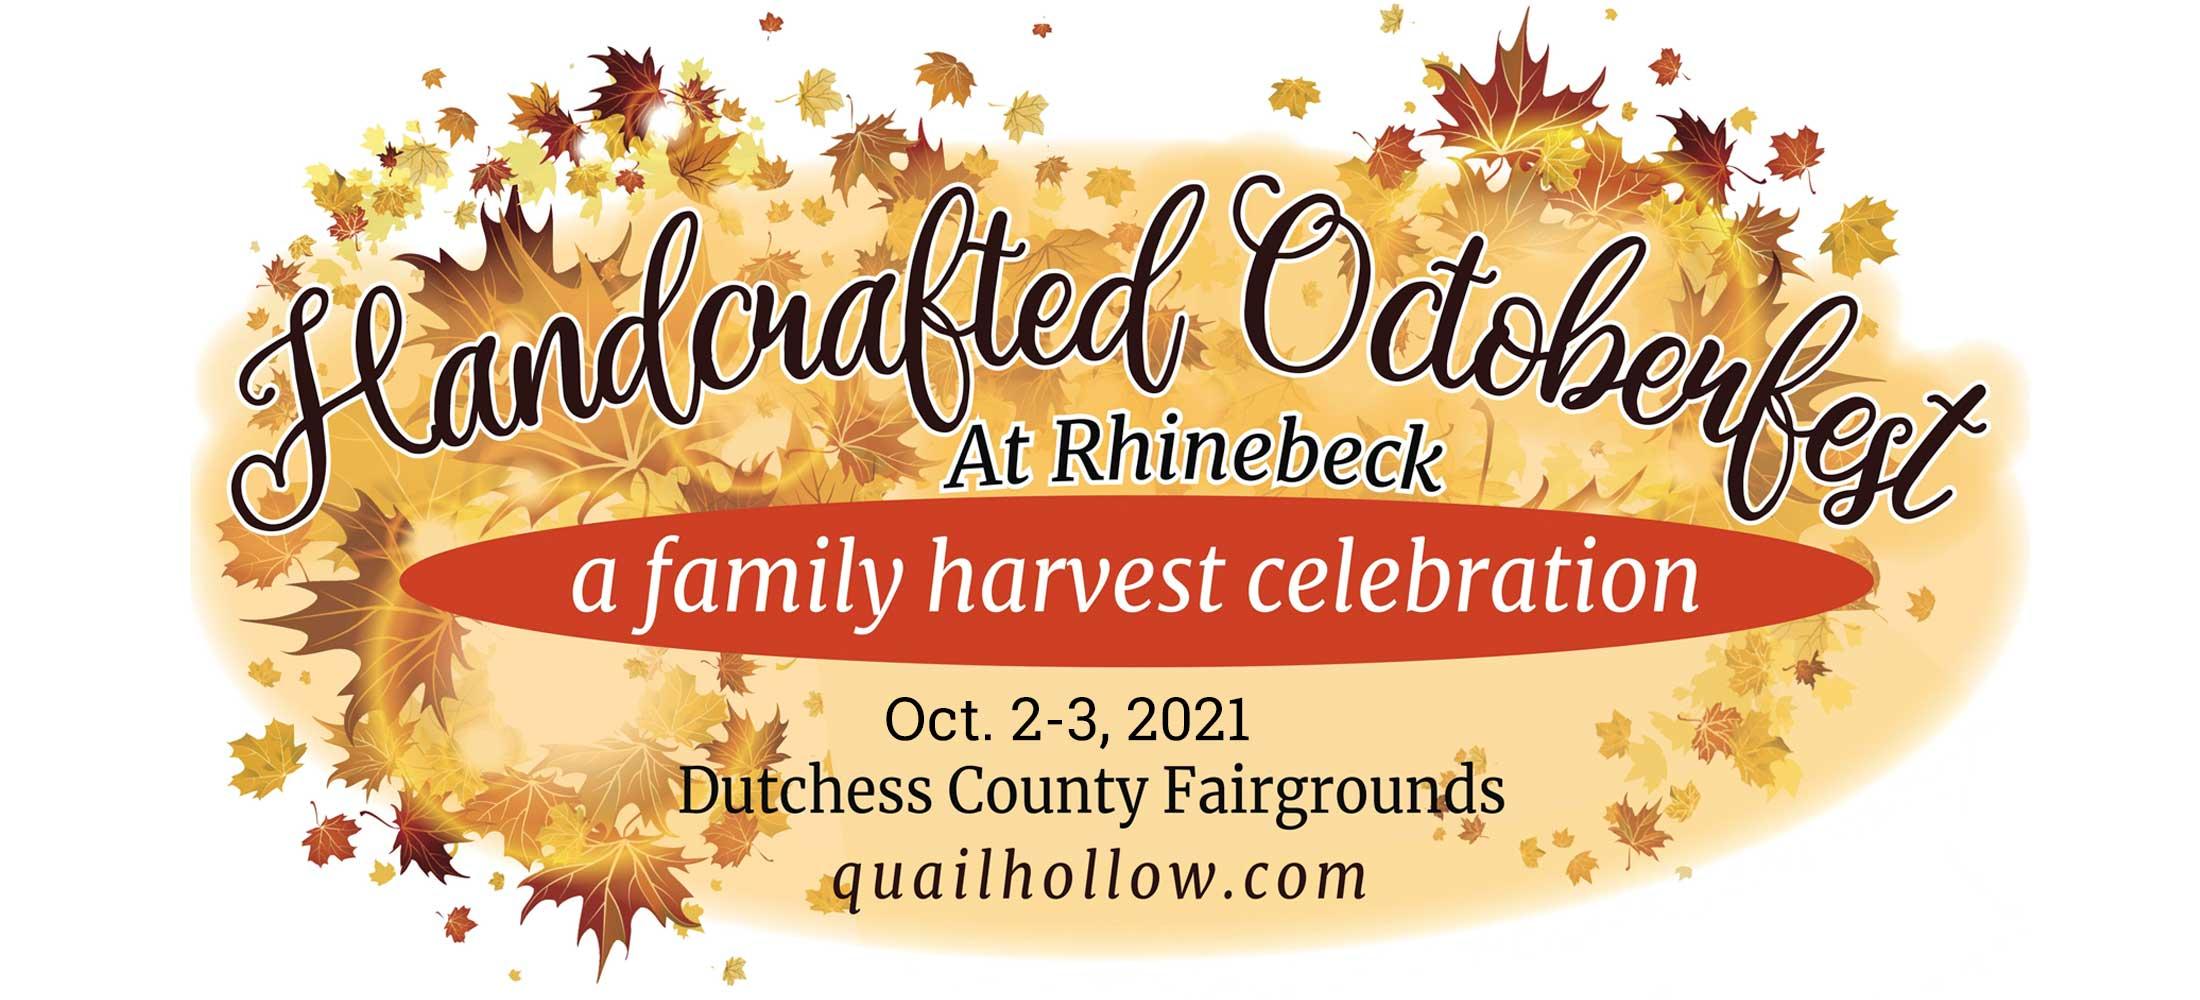 Handcrafted Octoberfest Rhinebeck